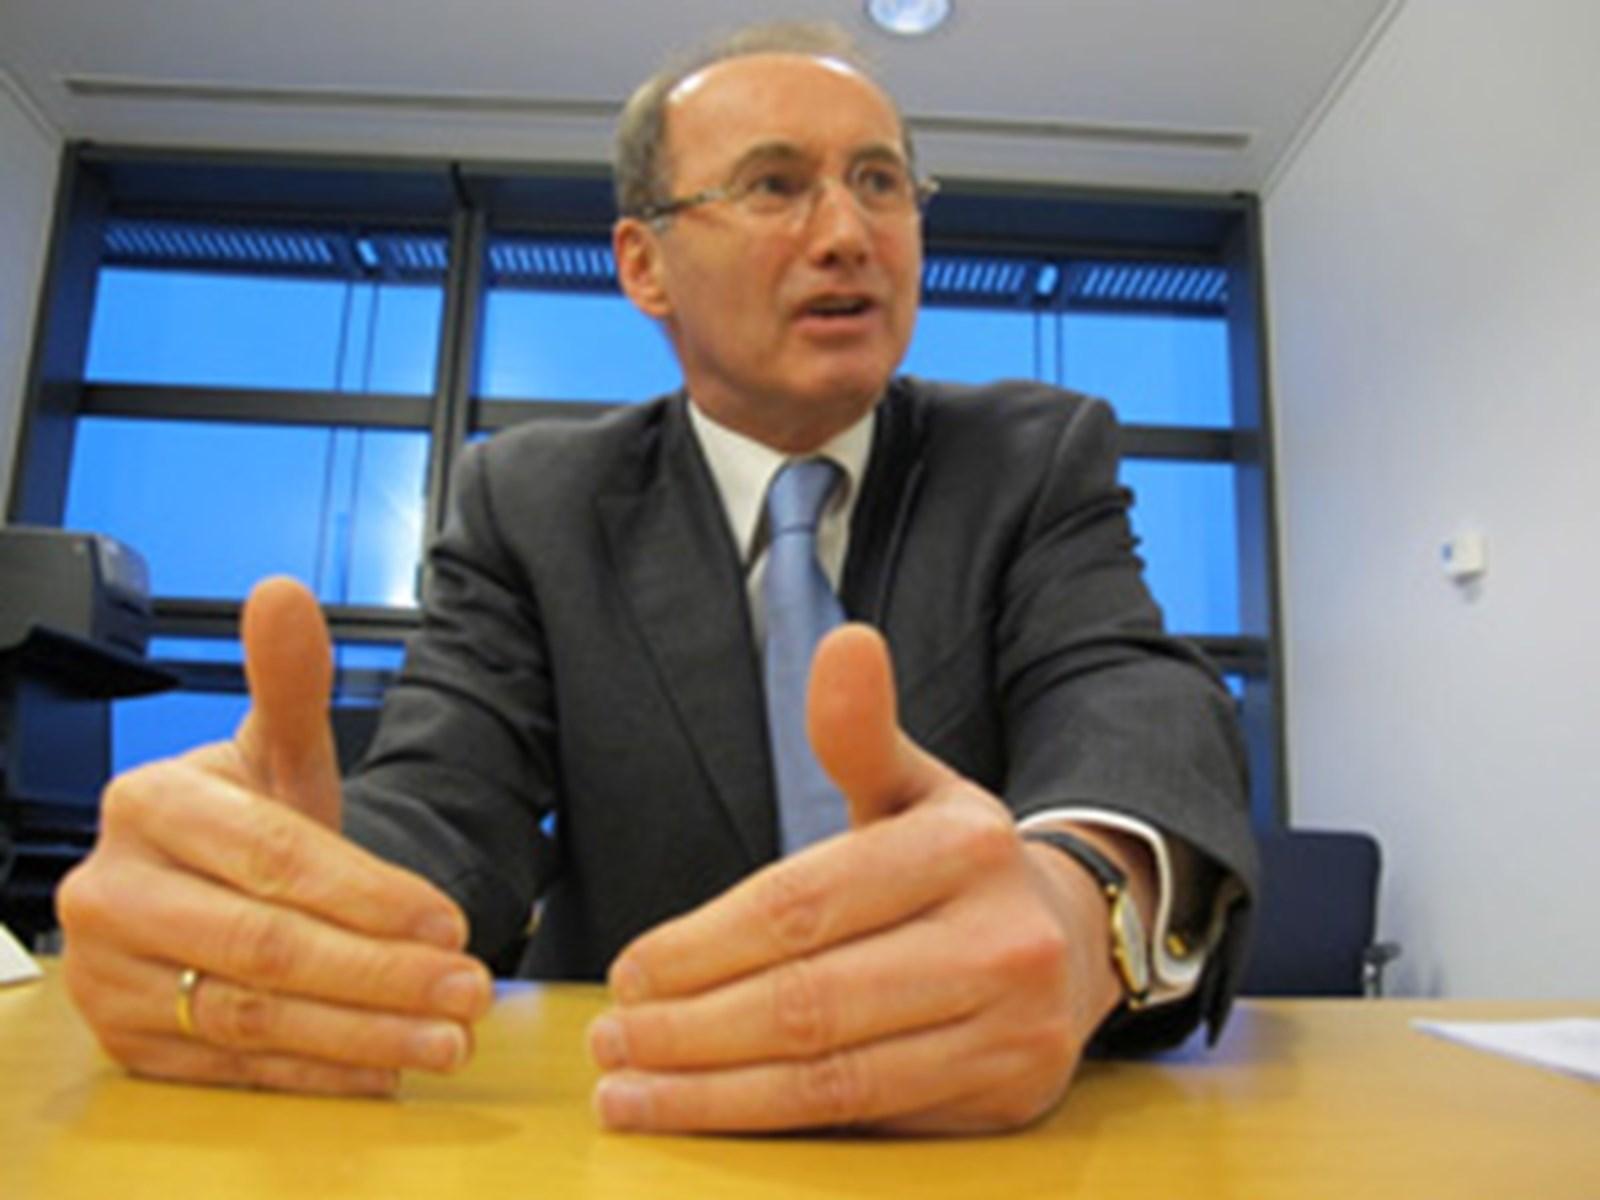 20.03.29 Othmar Karas Övp, Parlamento europeo